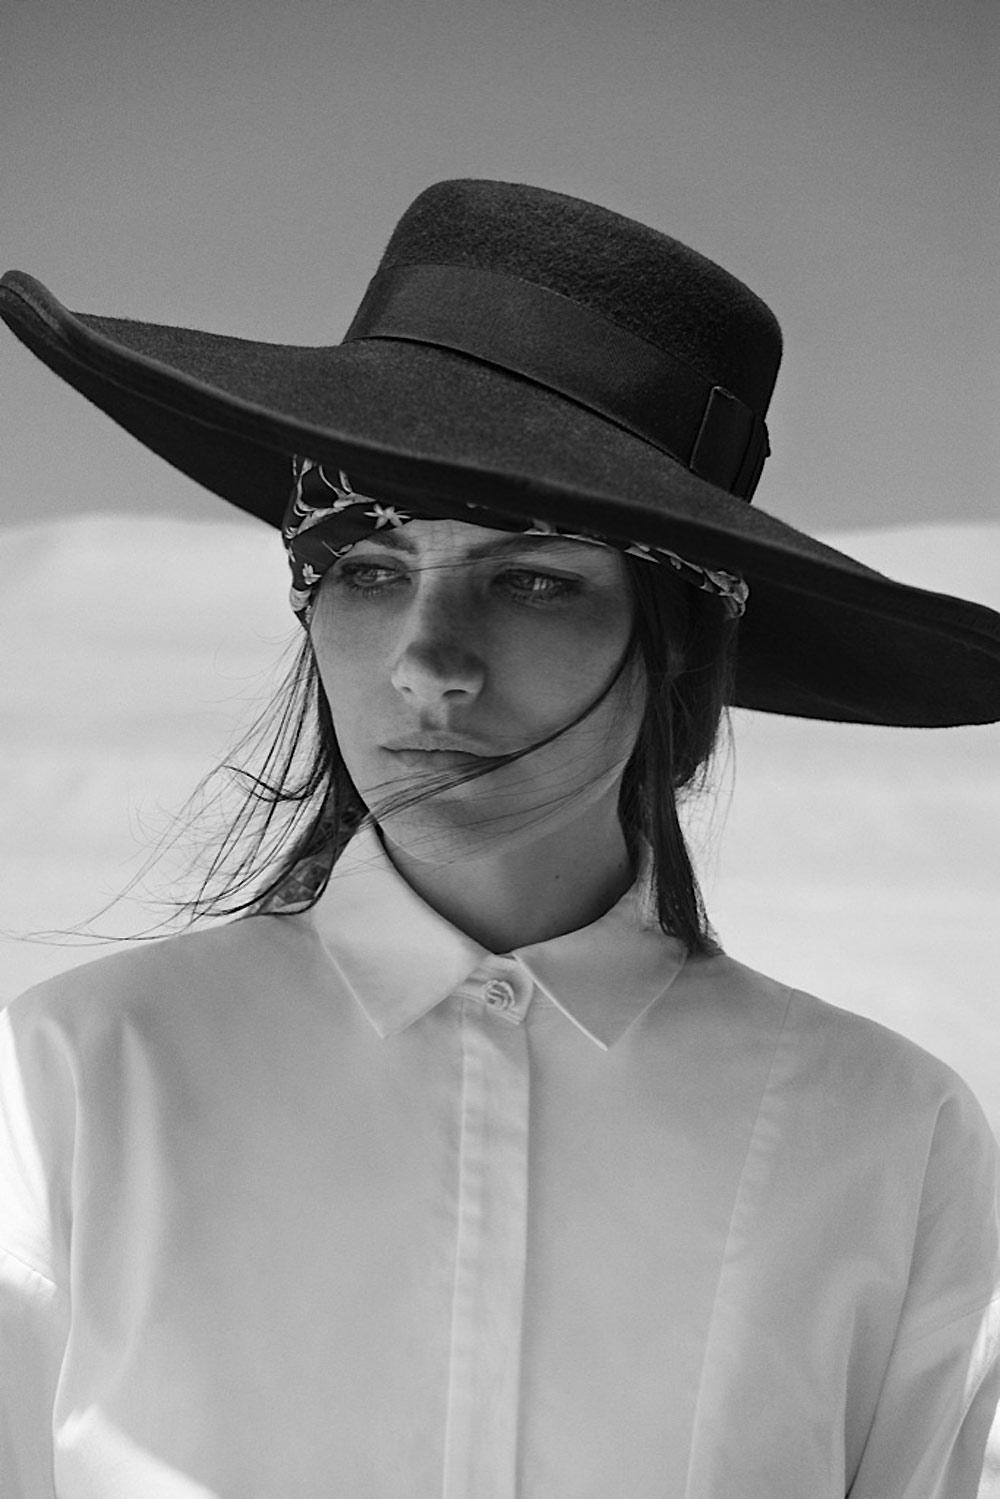 harpers bazaar fashion magazine russia missy rayder model alexander neumann photographer celine SS 2014 oracle fox oraclefox